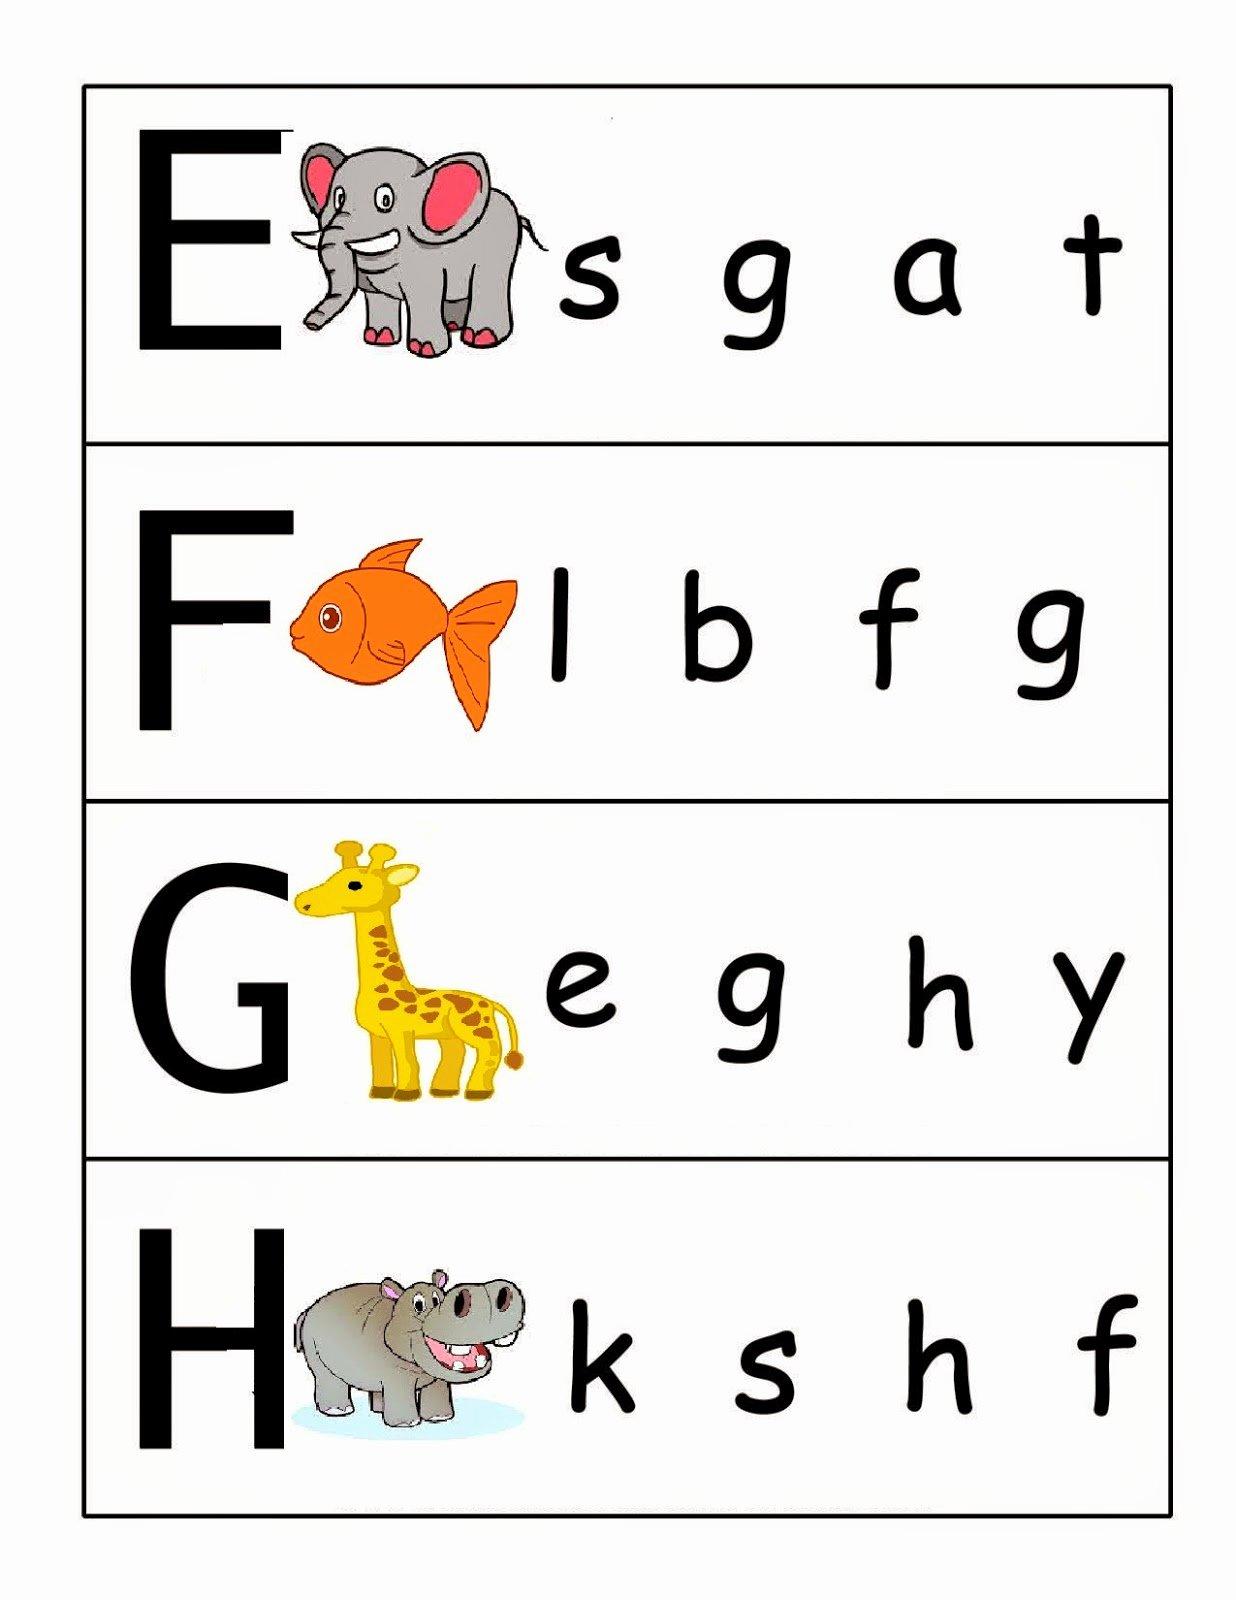 hight resolution of Lowercase Letters Worksheets for Preschoolers Fresh Kindergarten Worksheets  Match Upper Case and Lower Case – Printable Worksheets for Kids